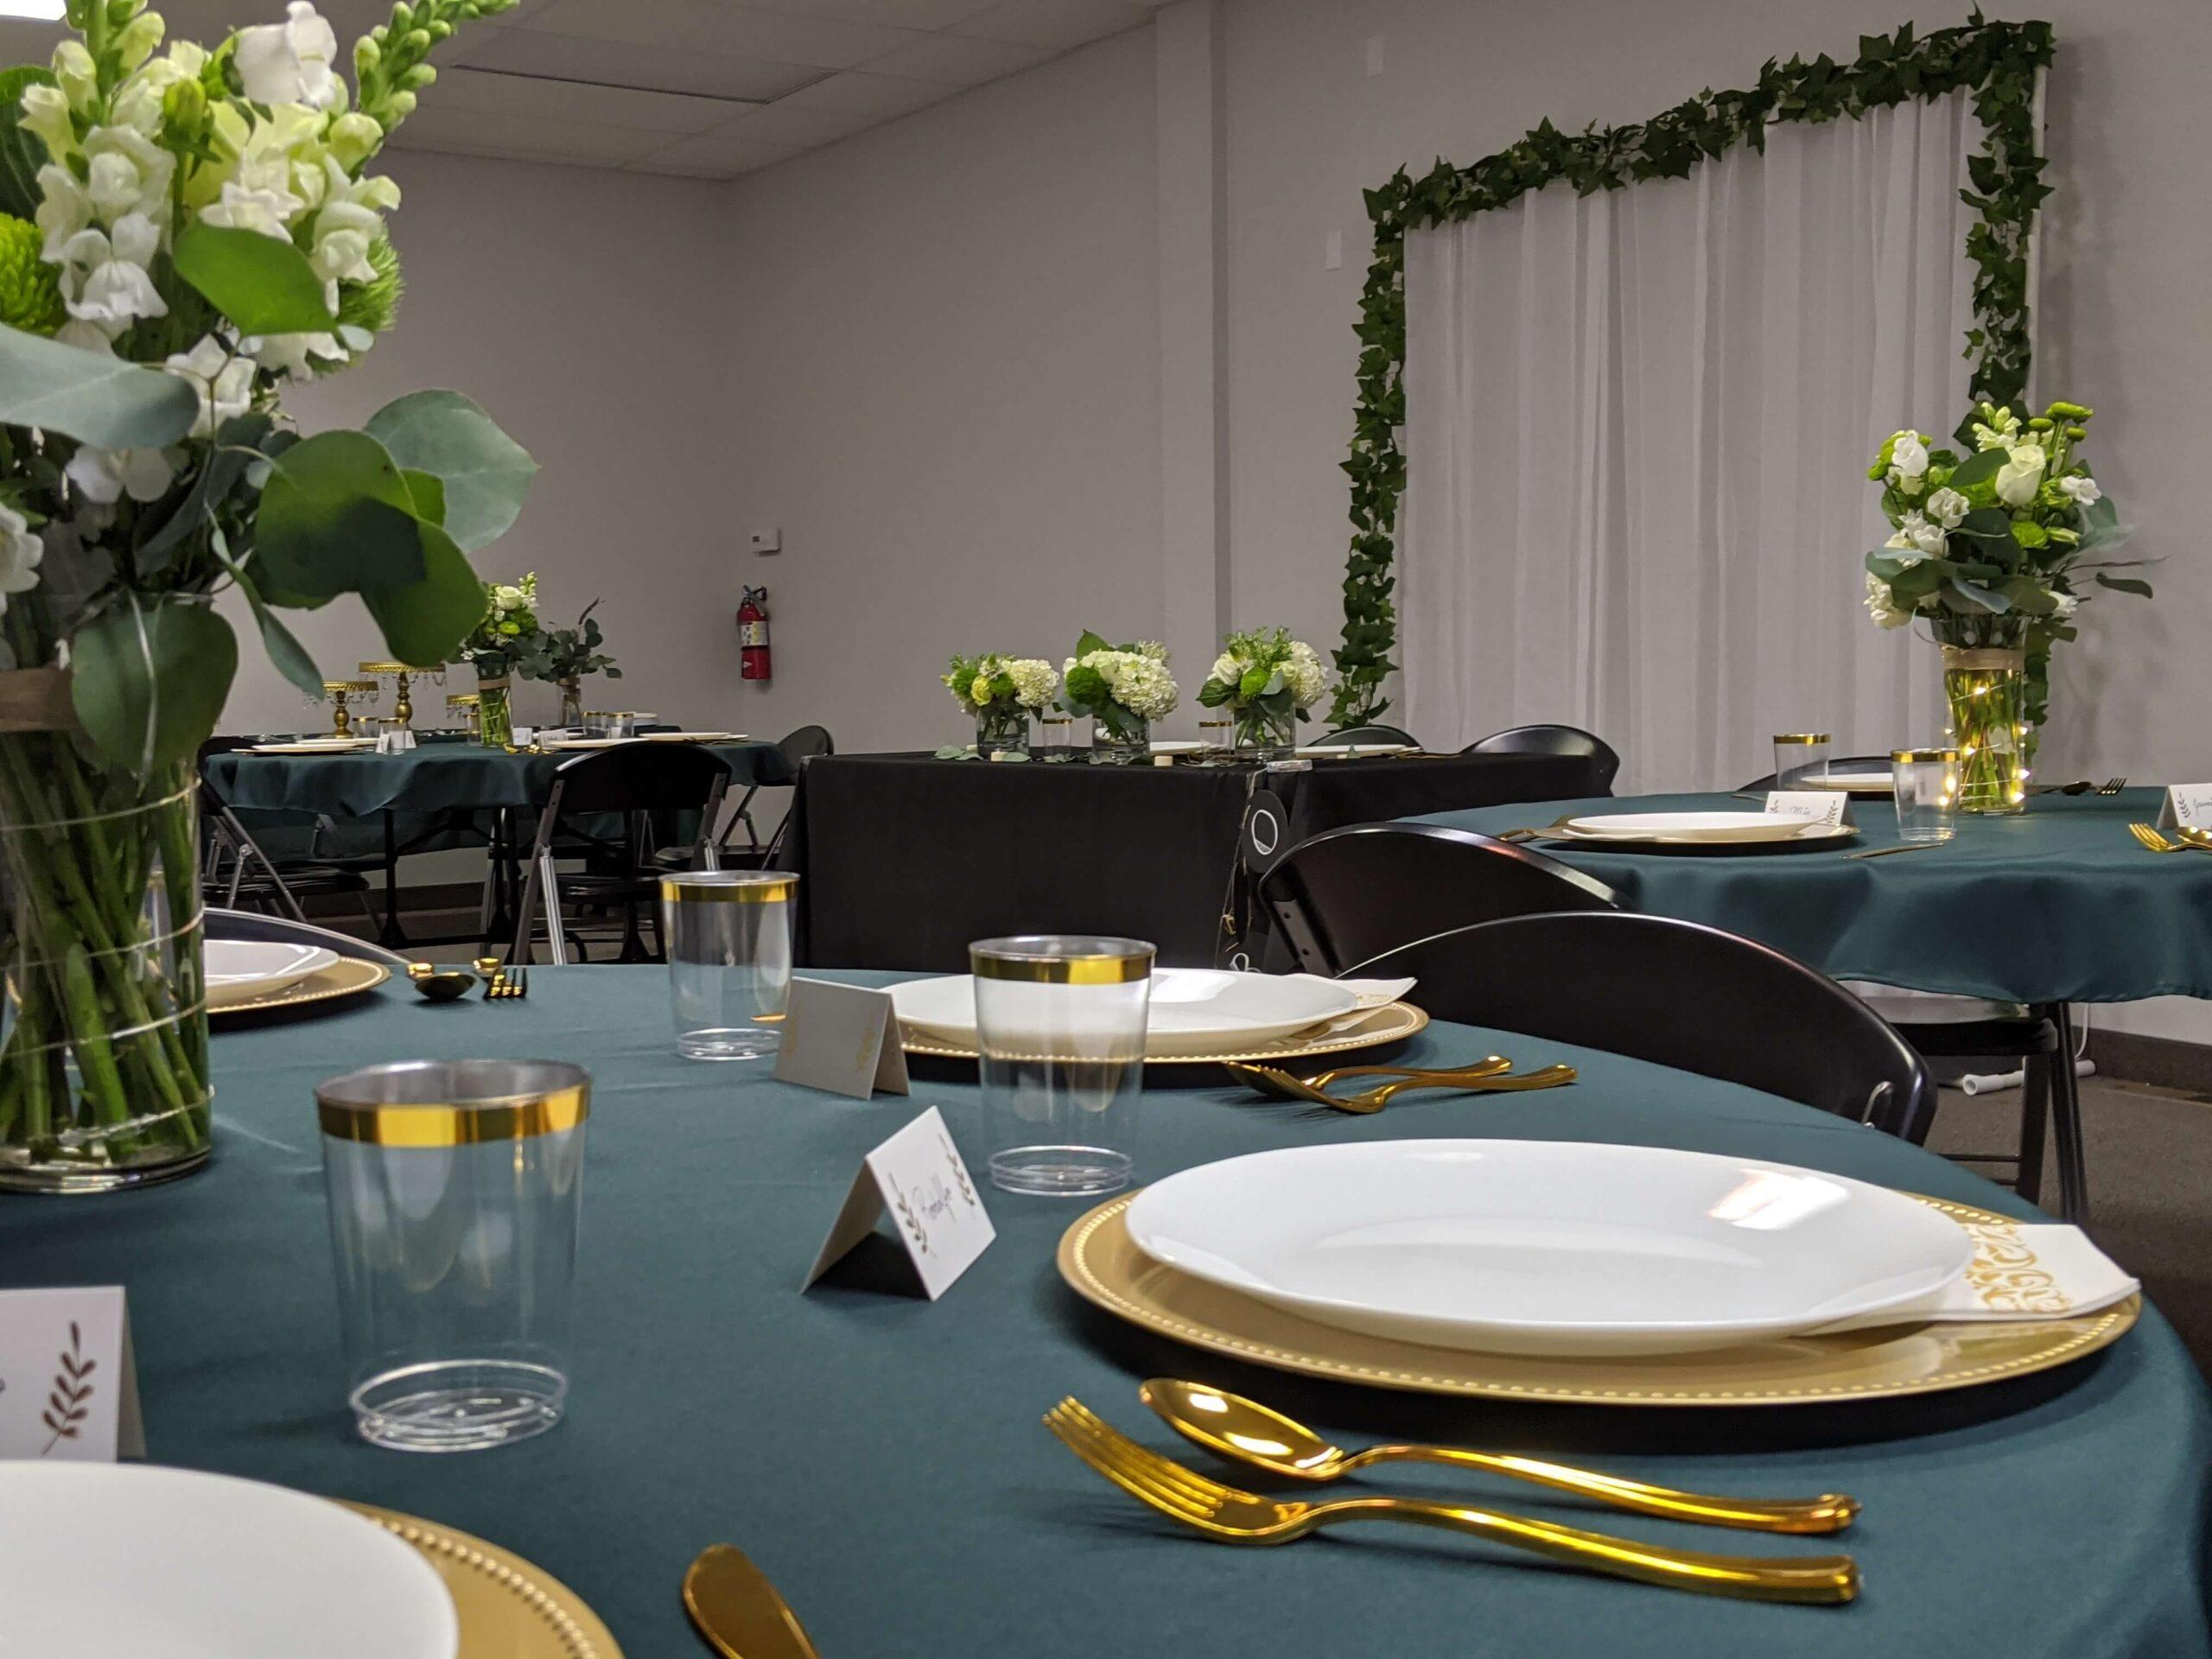 Event Center Wedding Reception Setup in Nampa, Idaho